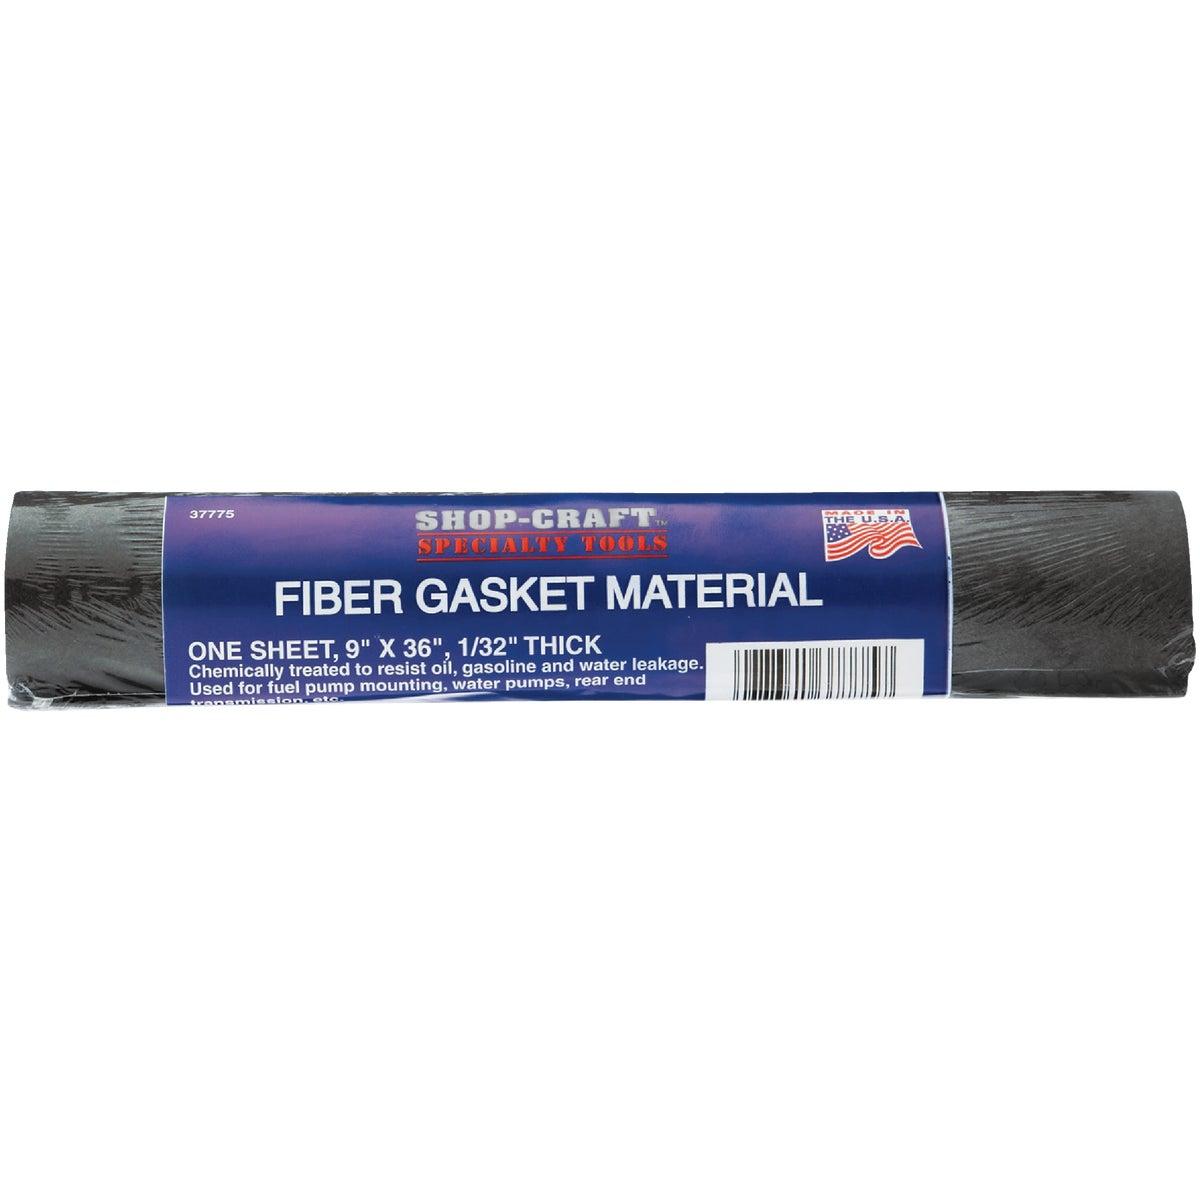 "1/32"" GASKET MATERIAL"